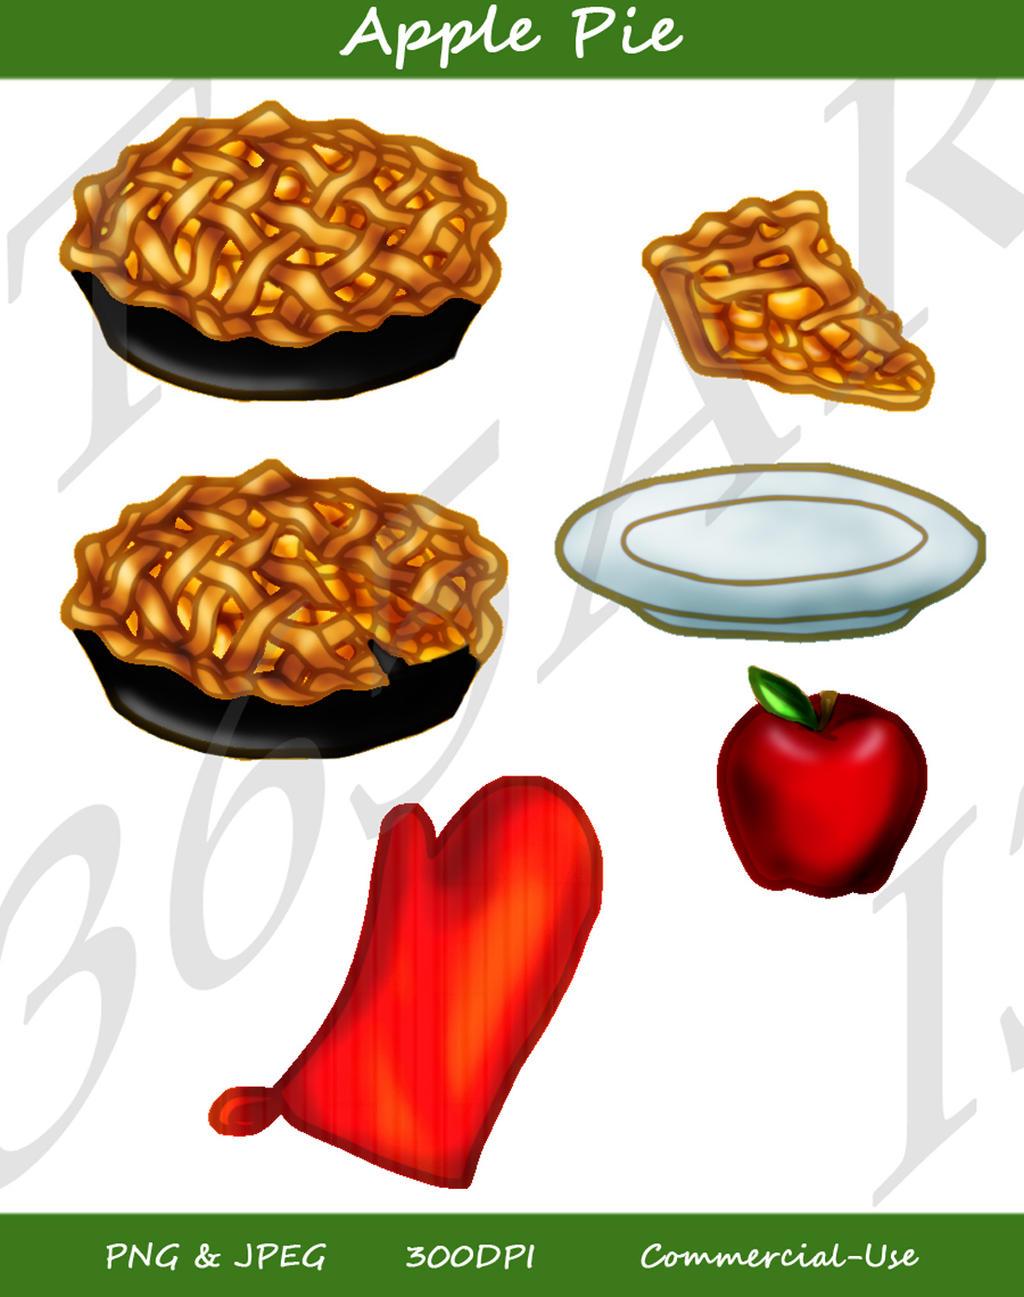 free food clipart apple pie - photo #31